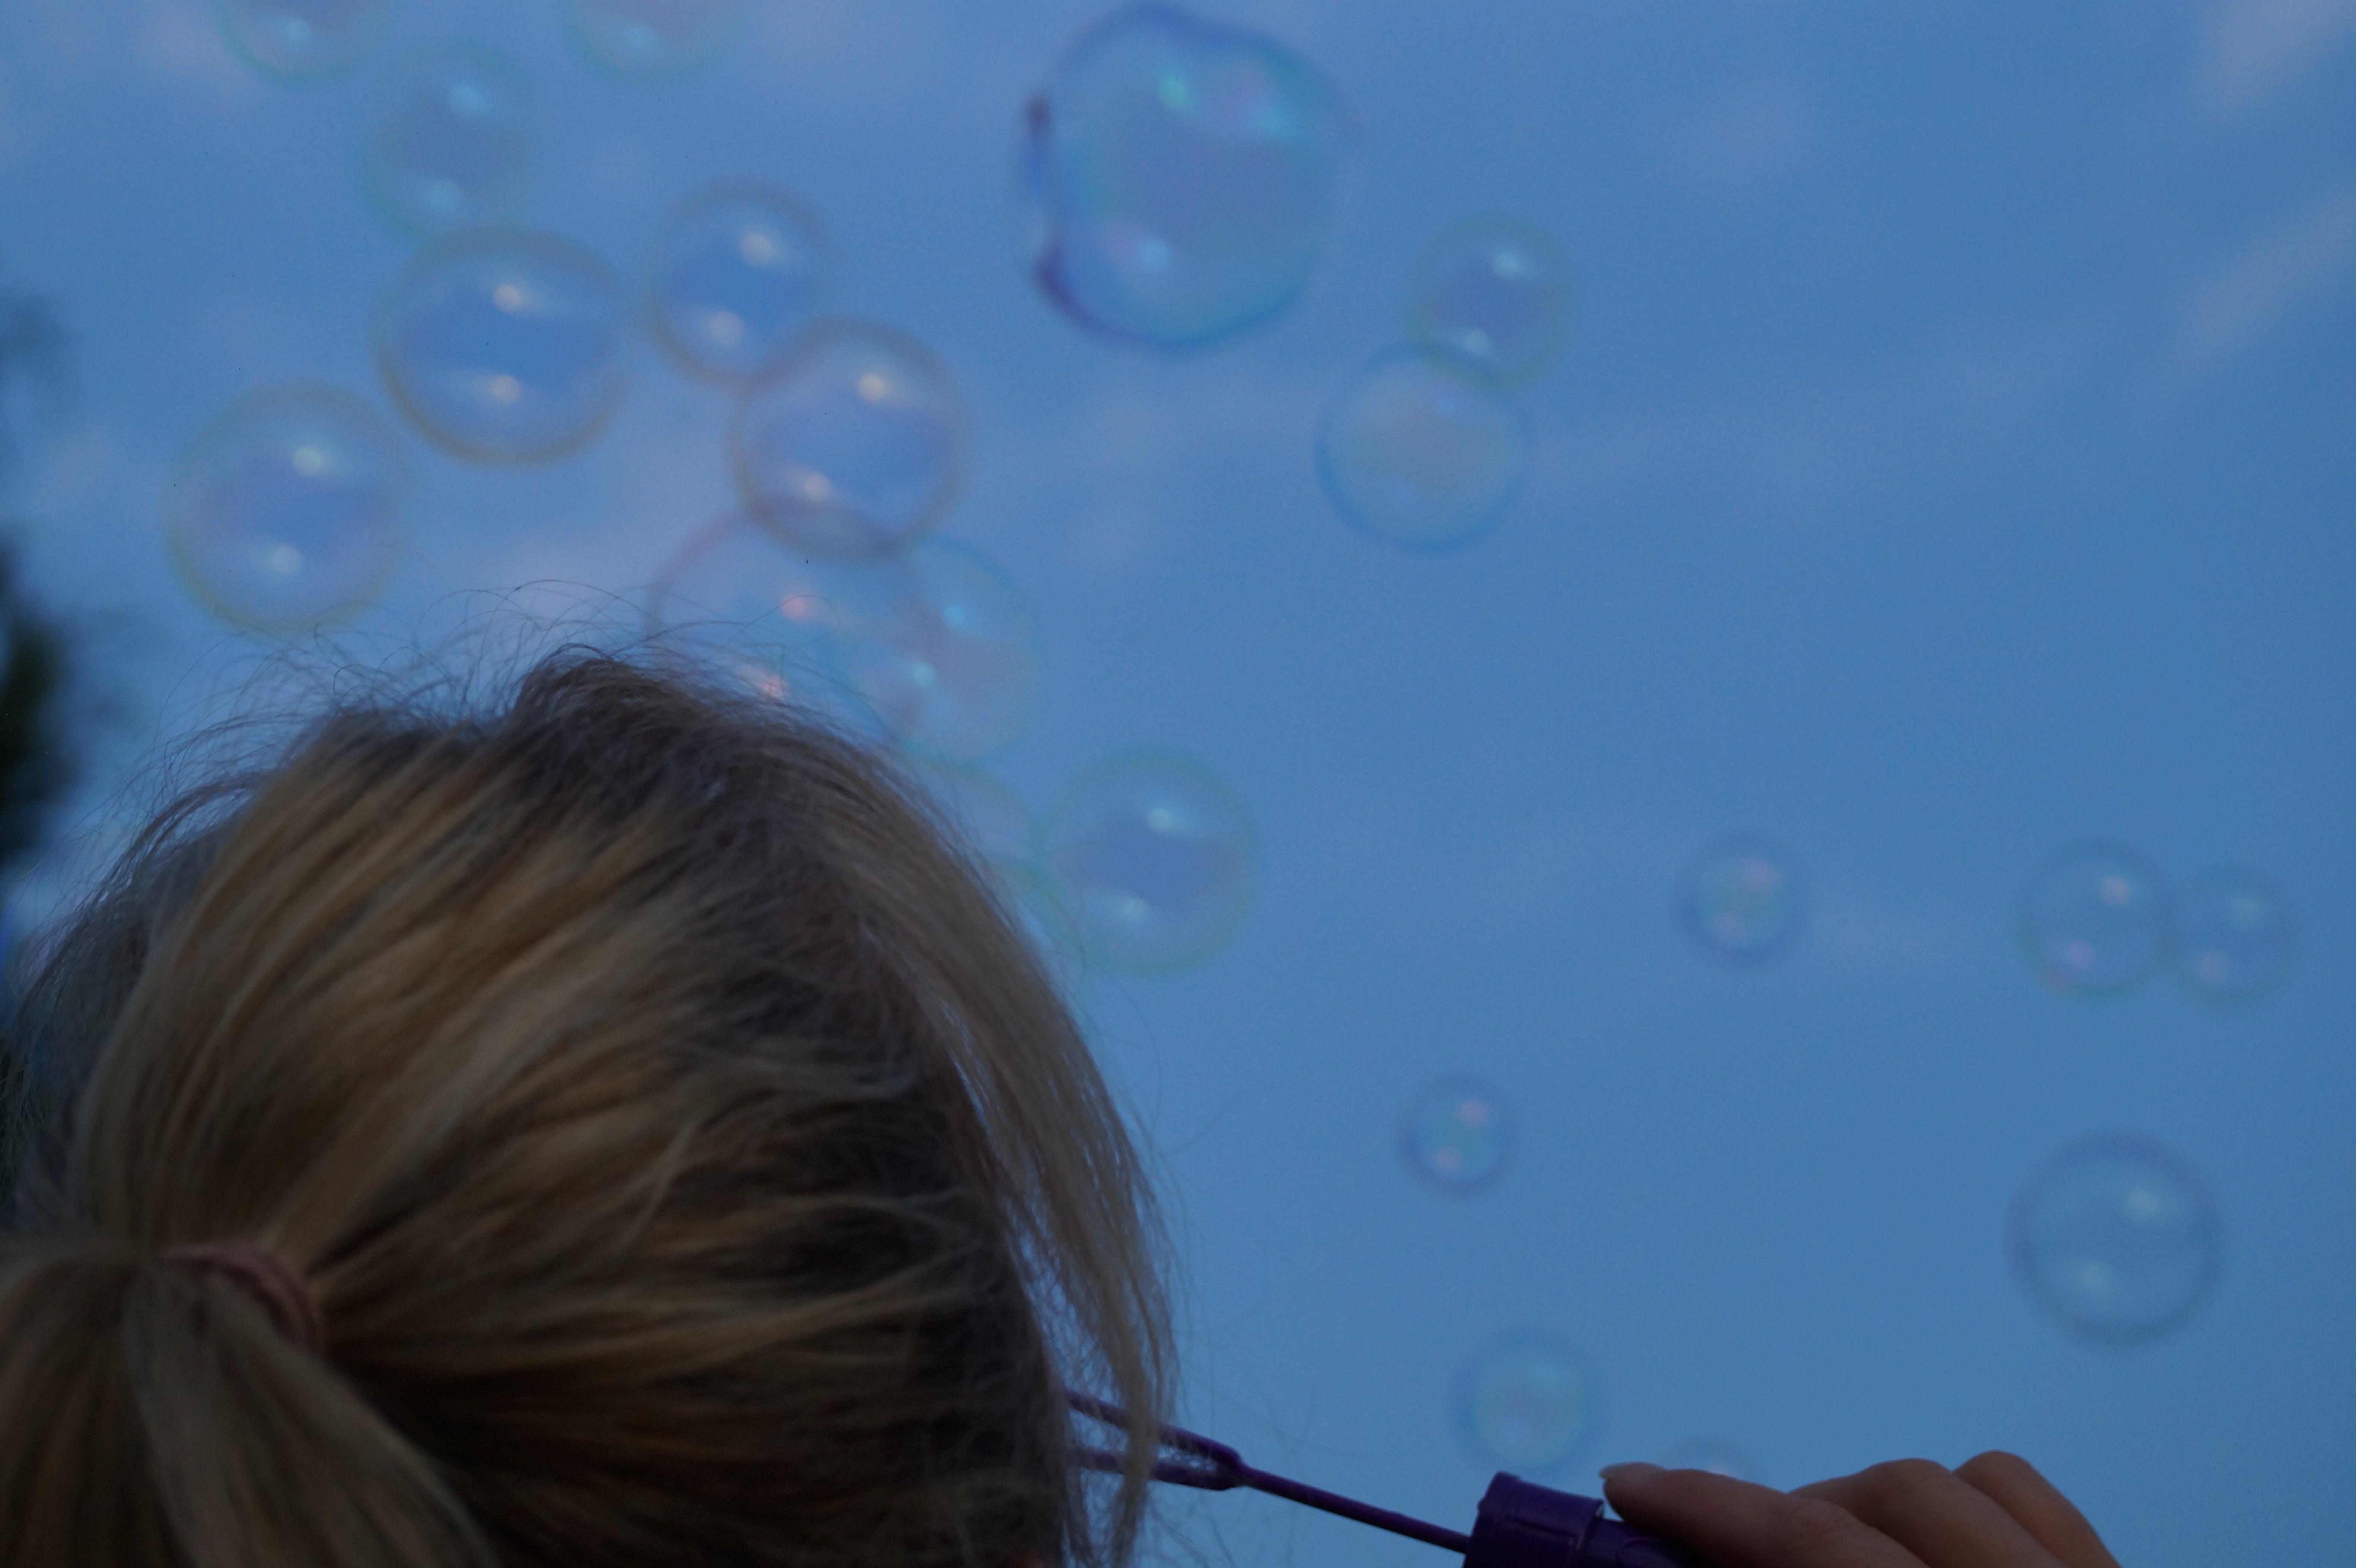 Free stock photo of soap bubbles